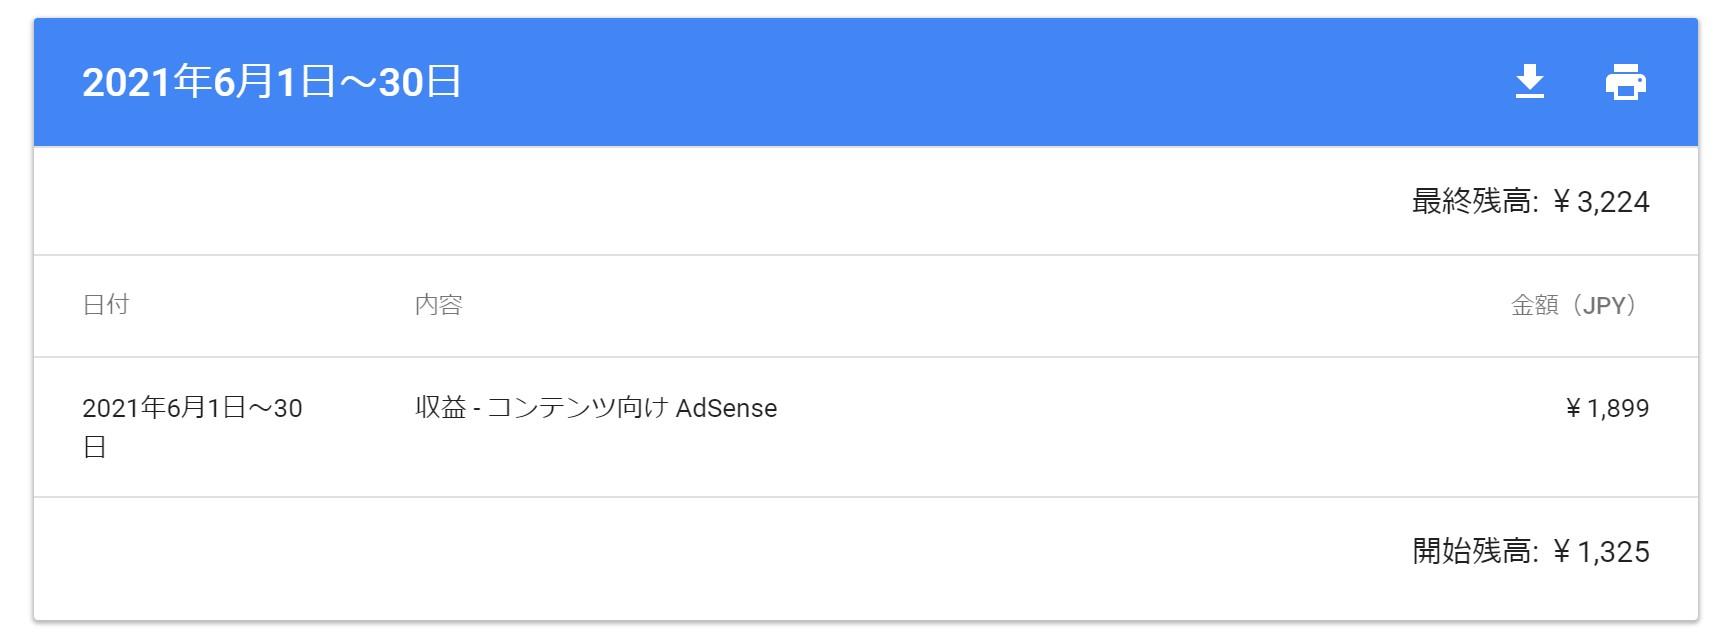 Google AdSenseの収益-202106